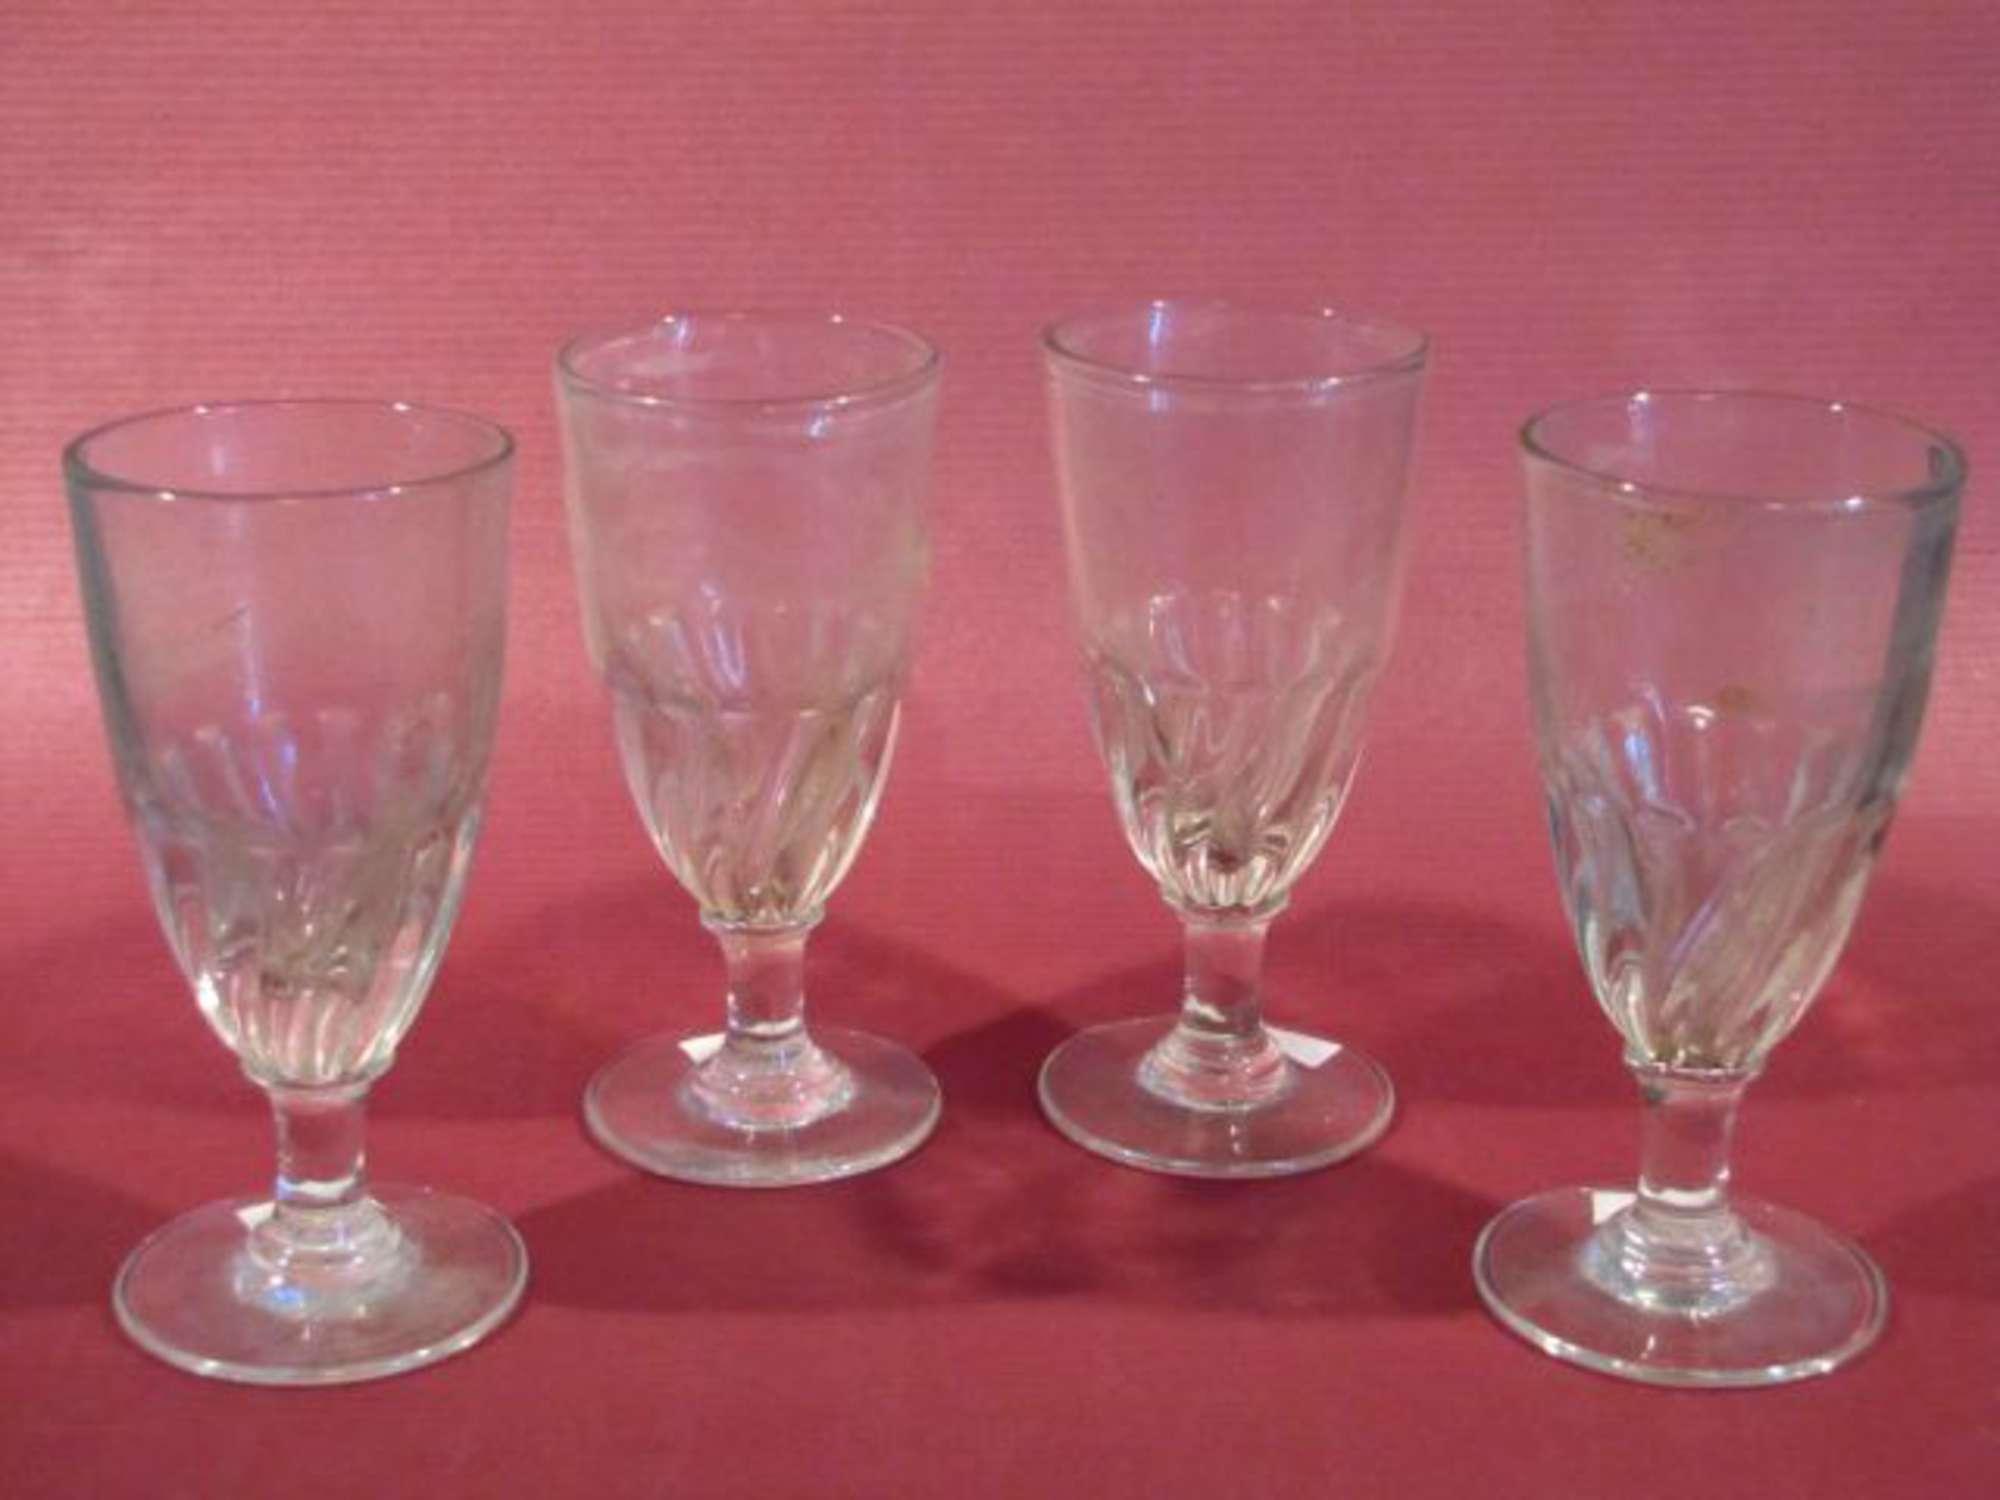 quatre verres boire verre translucide jambes droites h 14 cm france fin xixe vente. Black Bedroom Furniture Sets. Home Design Ideas